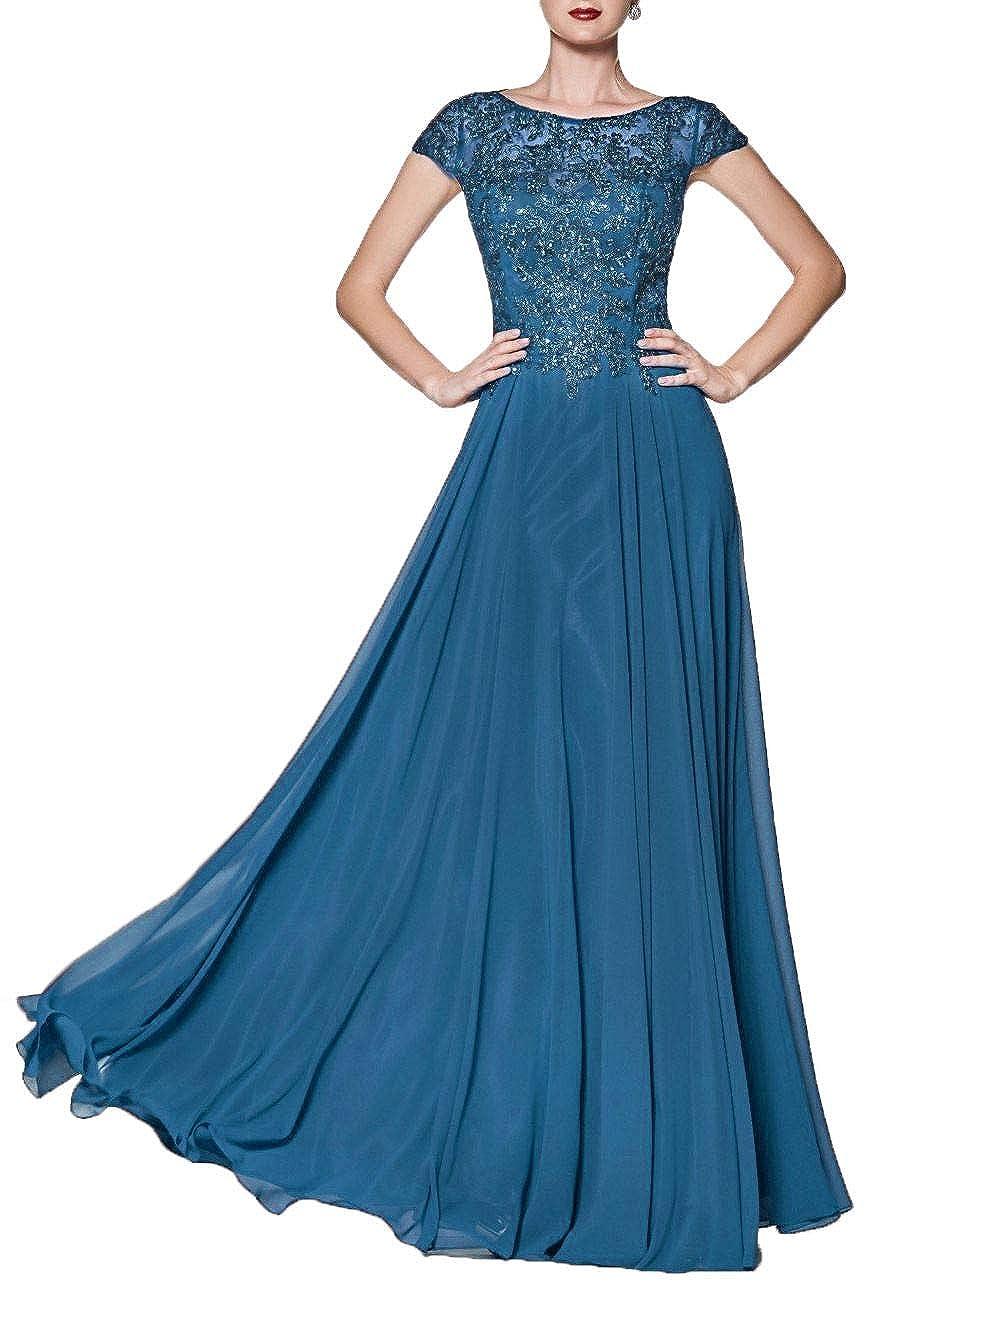 bluee Wanshaqin Women's Illusion Neckline Jeweled Waist Long Evening Gown Prom Formal Dress Bridesmaid Gown